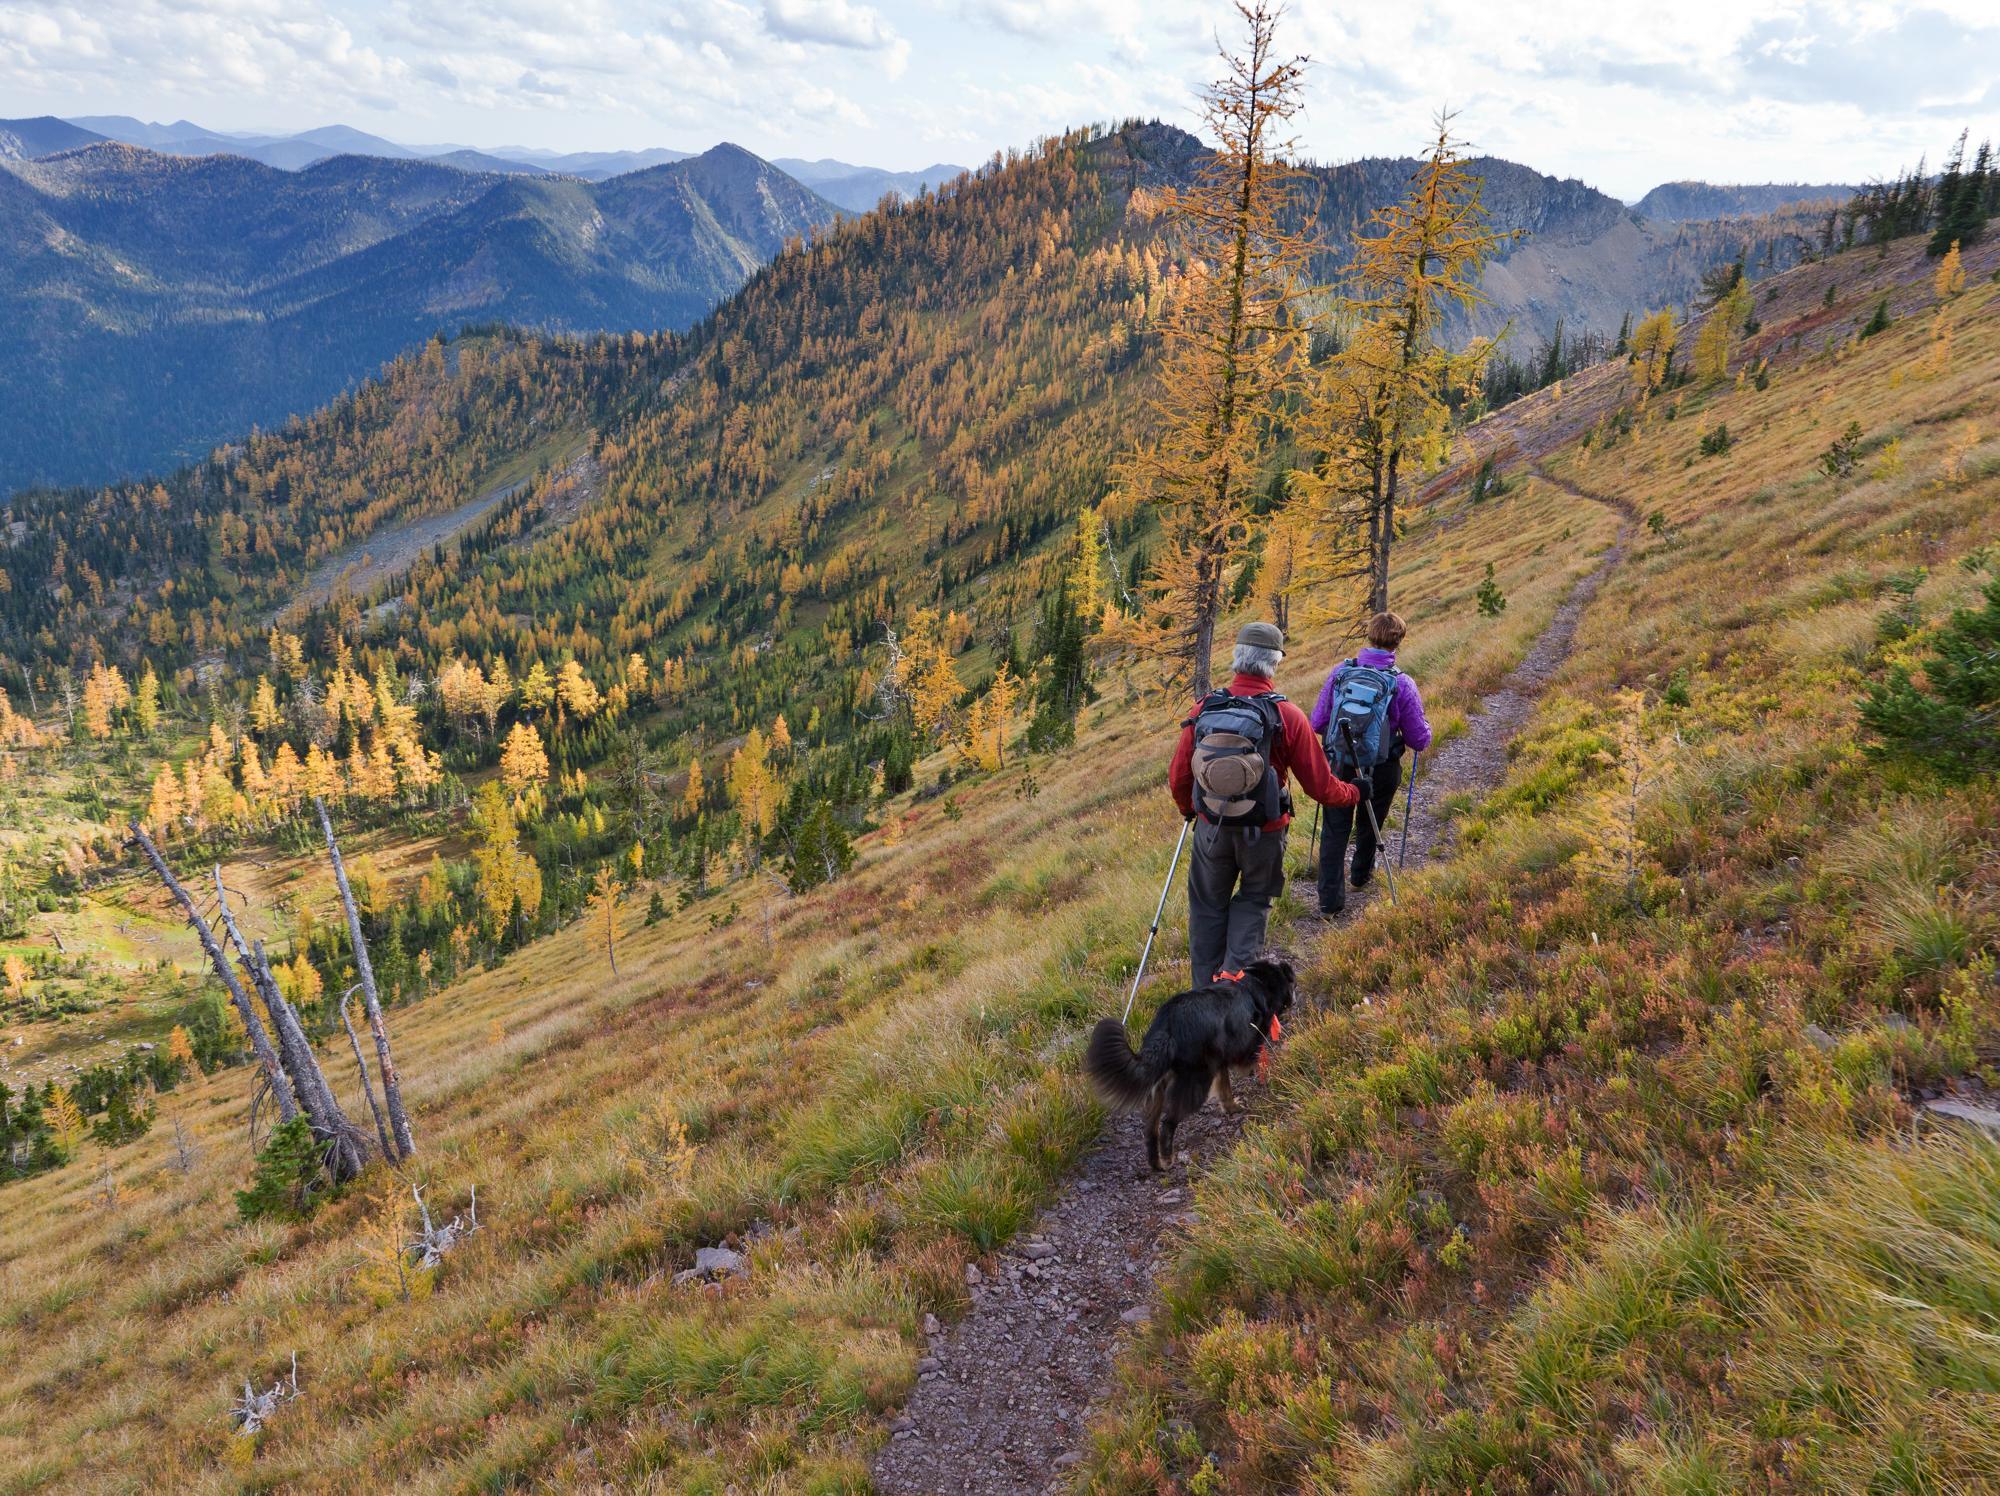 Hiking in the Whitefish Range // Photo: Chuck Haney